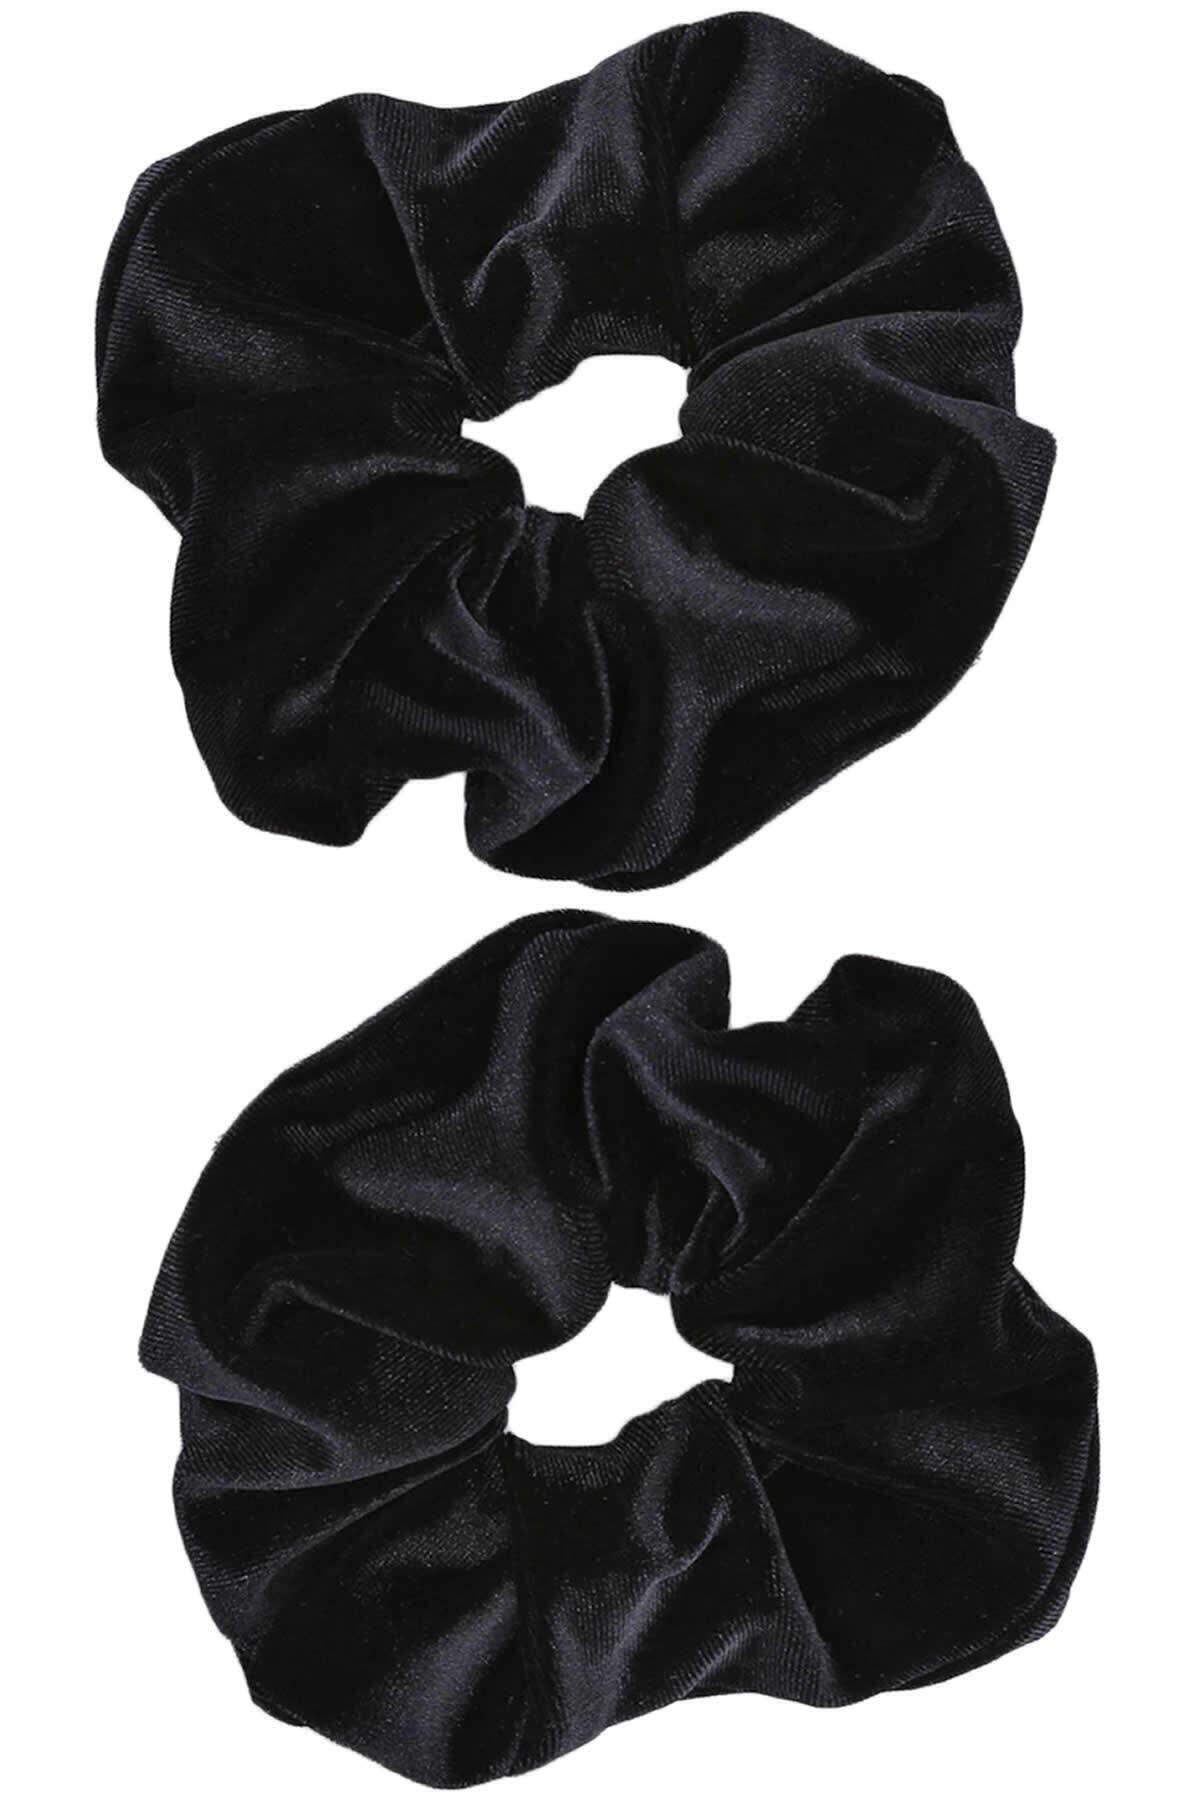 İnci Accessories 2 ' Li Kadife Siyah Lastik Toka 1